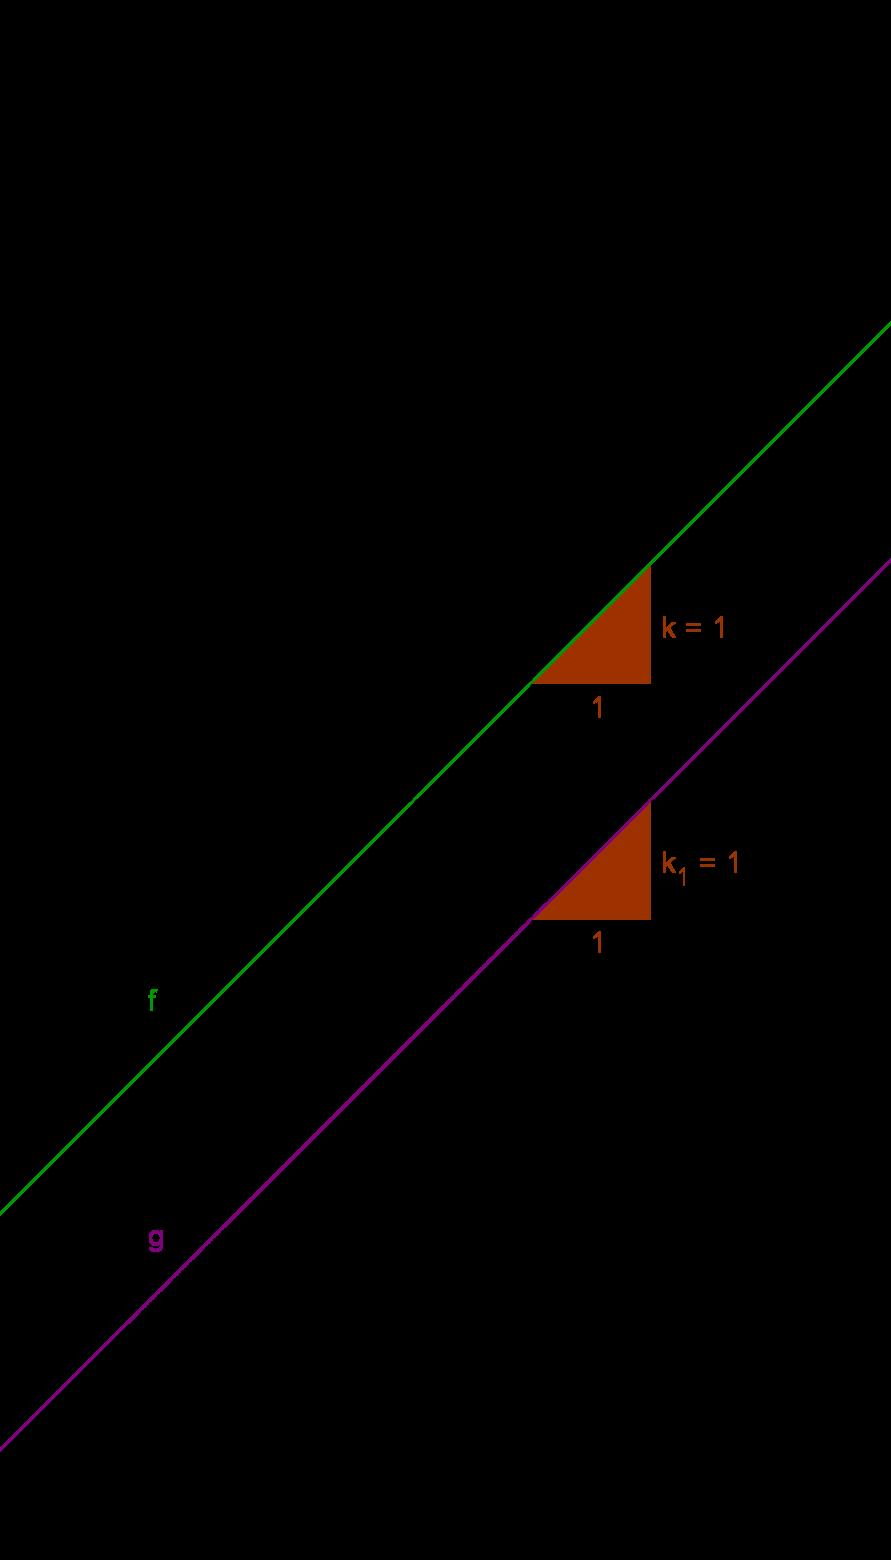 Lineare Gleichungssysteme - Lernpfad